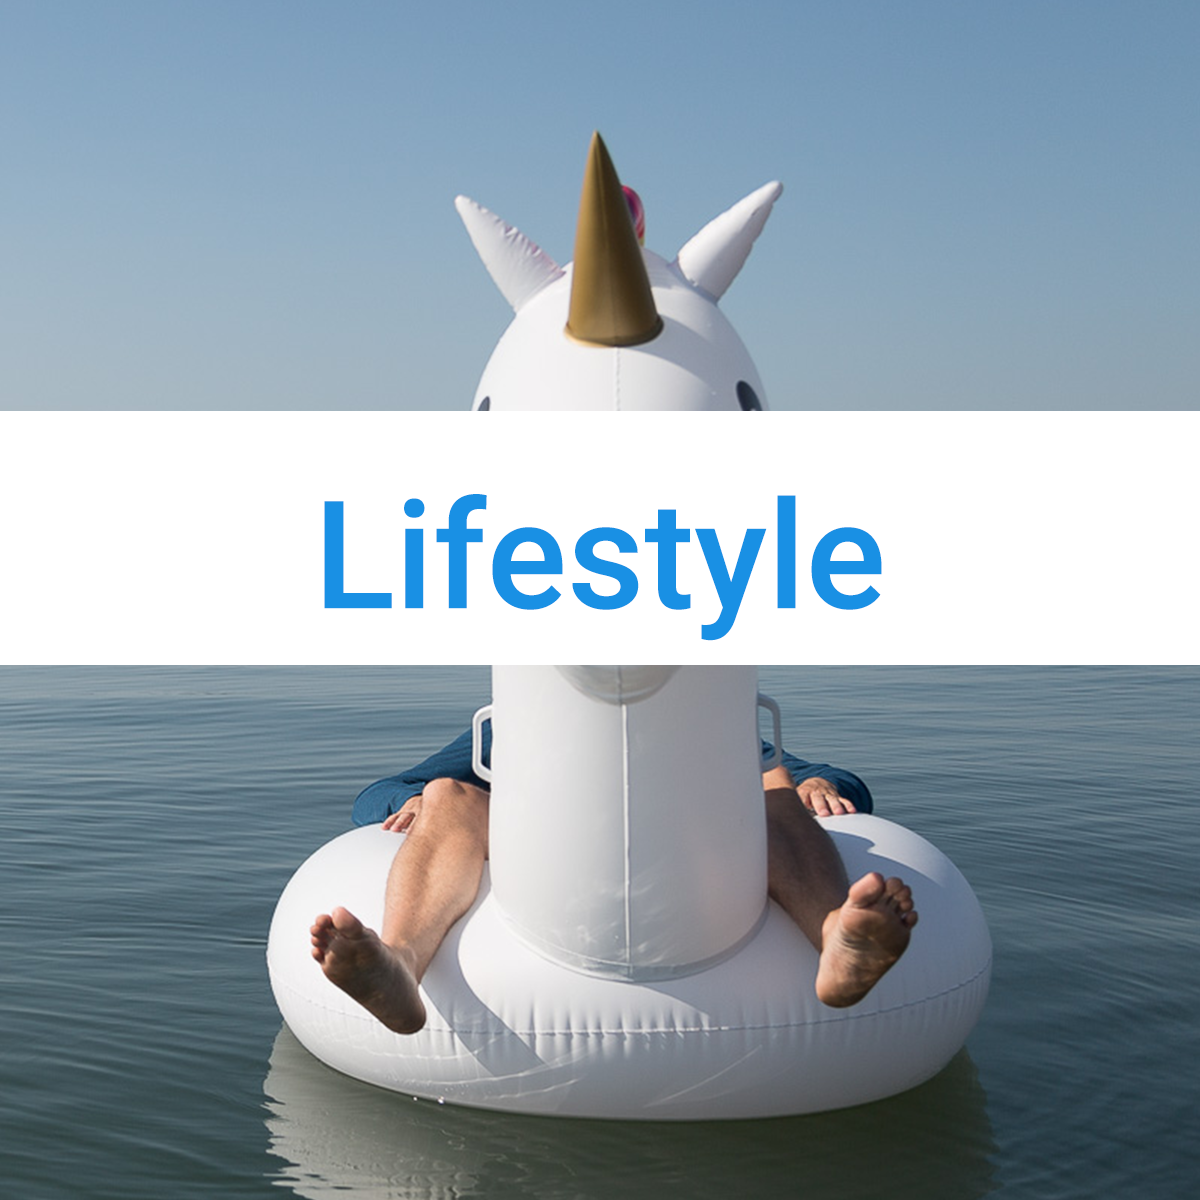 lifestyle-roberto-light-blue.png